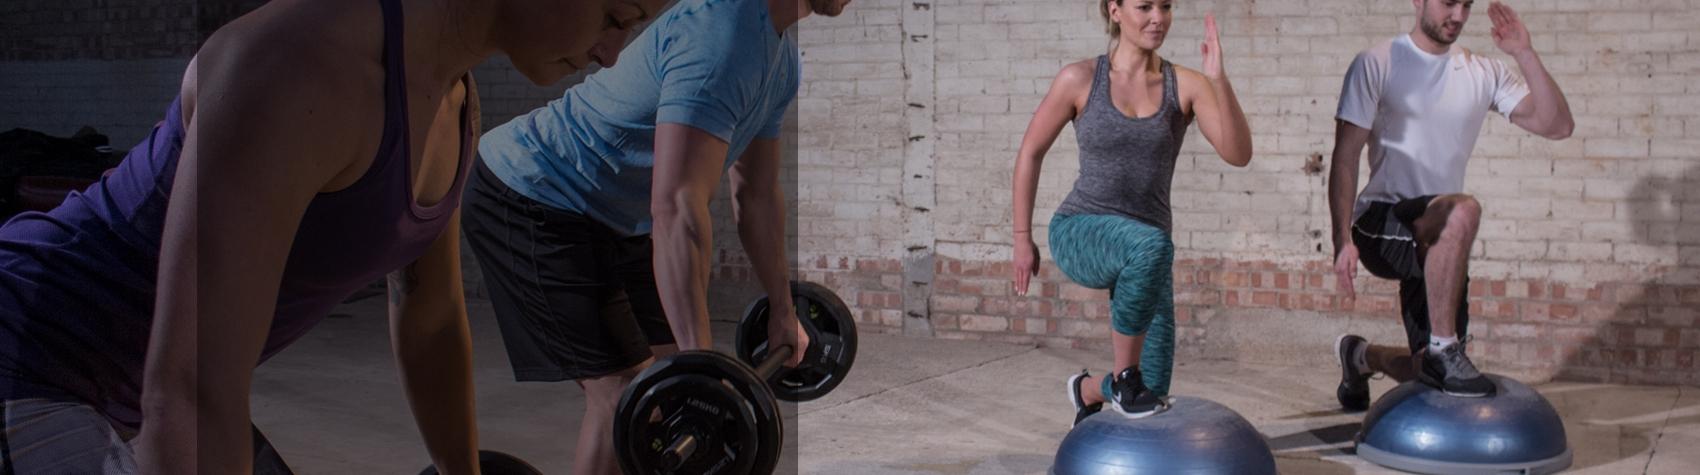 Up to 25 OFF BOSU Home Balance Trainer